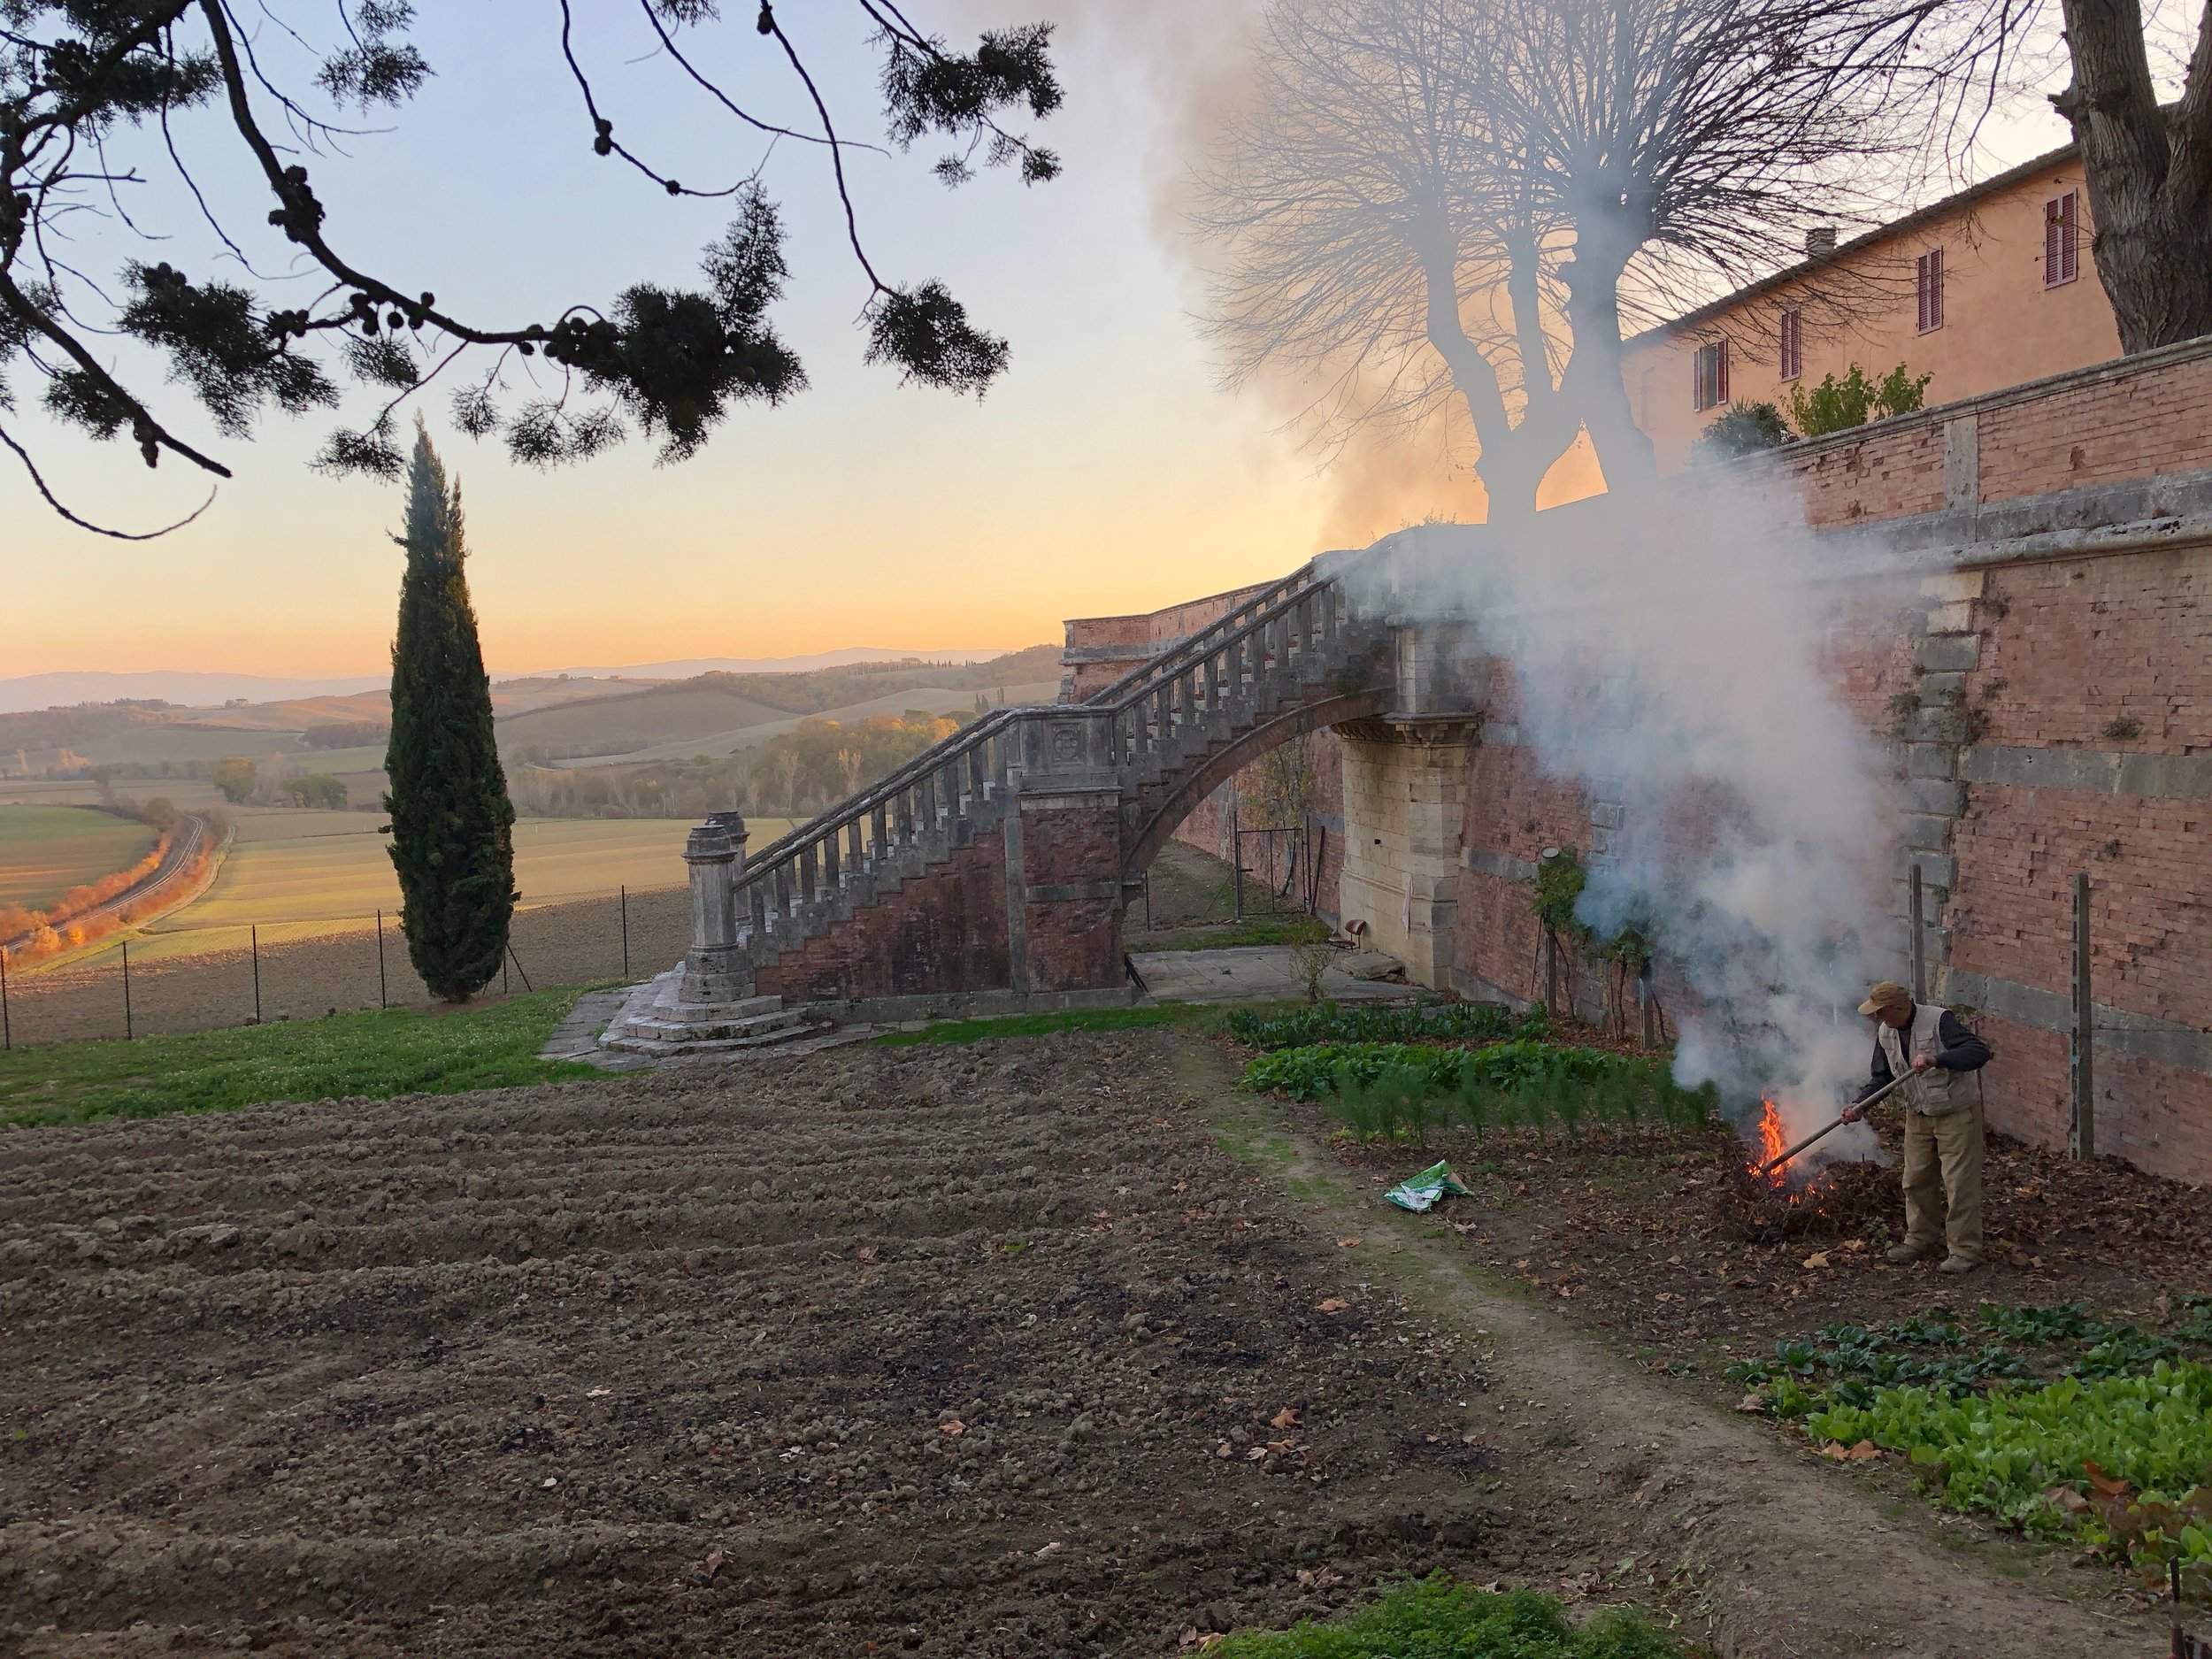 Quinciano, Tuscany